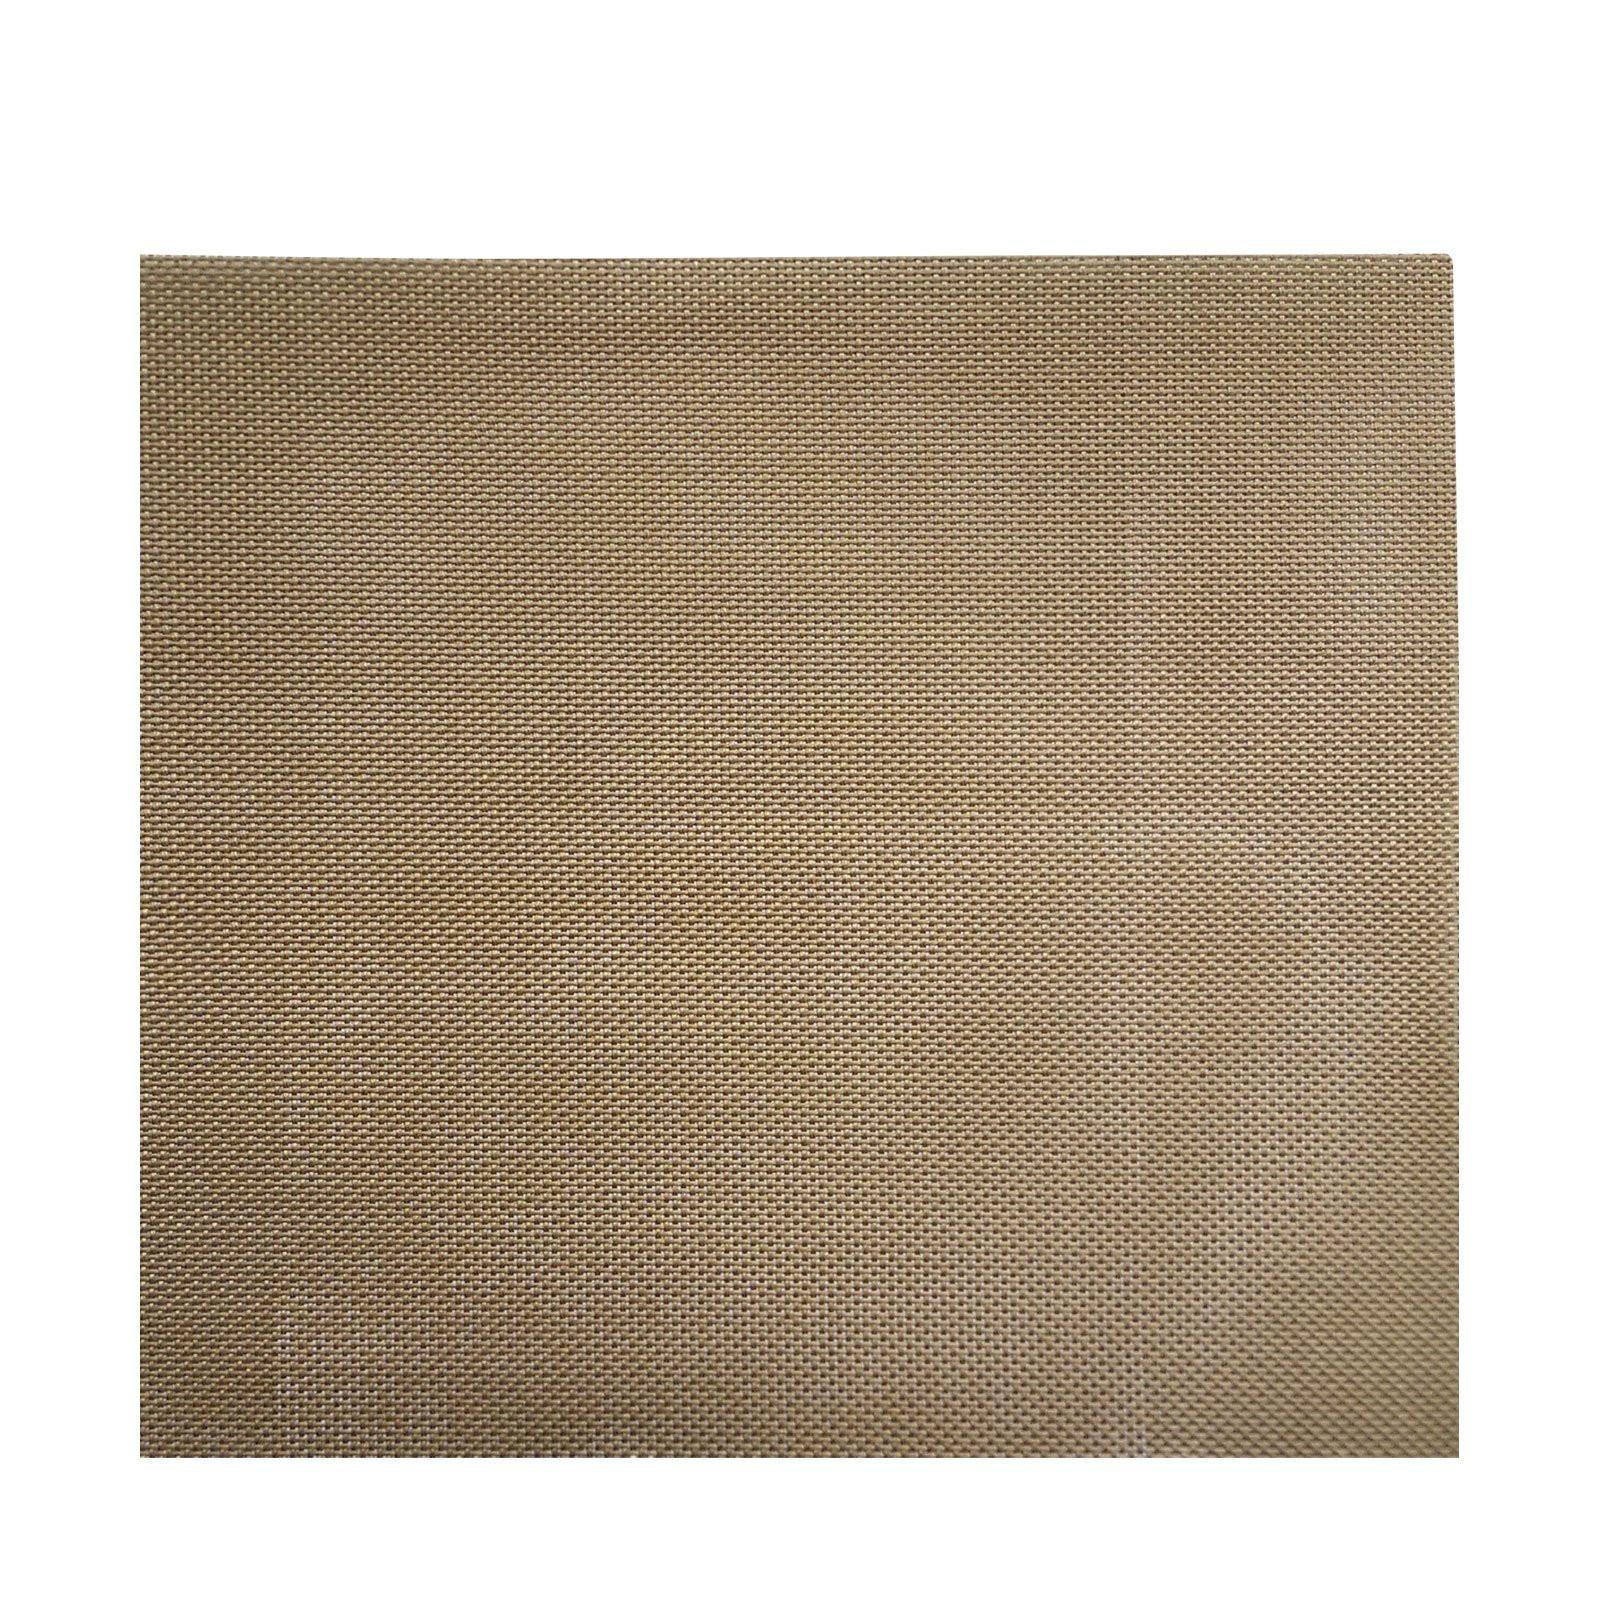 BioChef Savana 6/9/12 Tray Mesh Sheet - 6 Packs